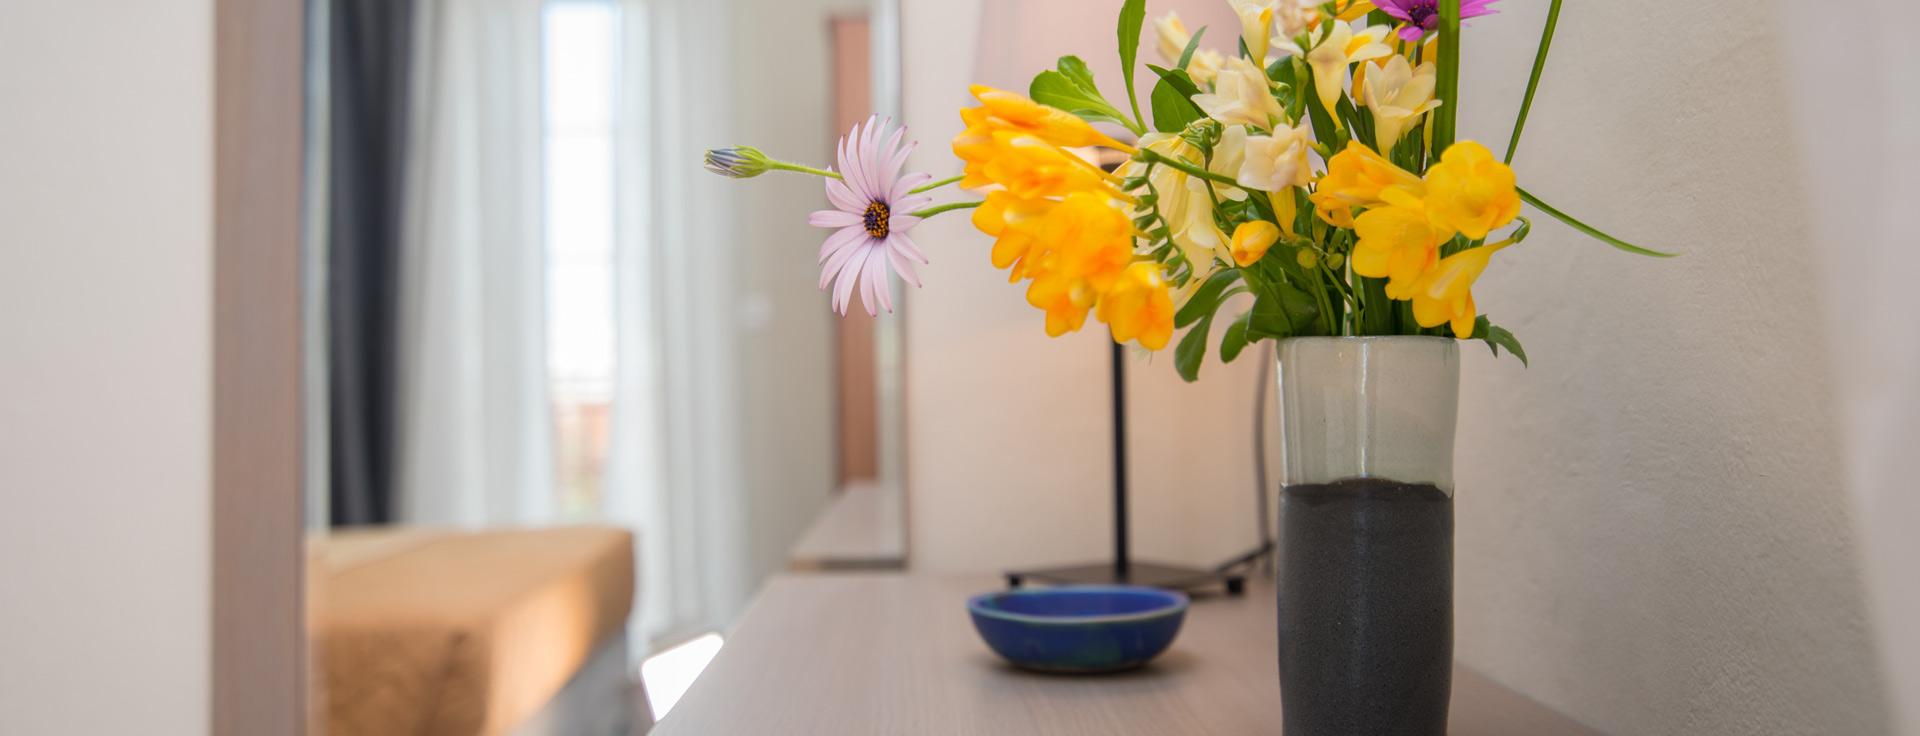 Superior Διαμέρισμα στο Lemonia Accommodations με 3 δωμάτια & βεράντα με θέα τη θάλασσα